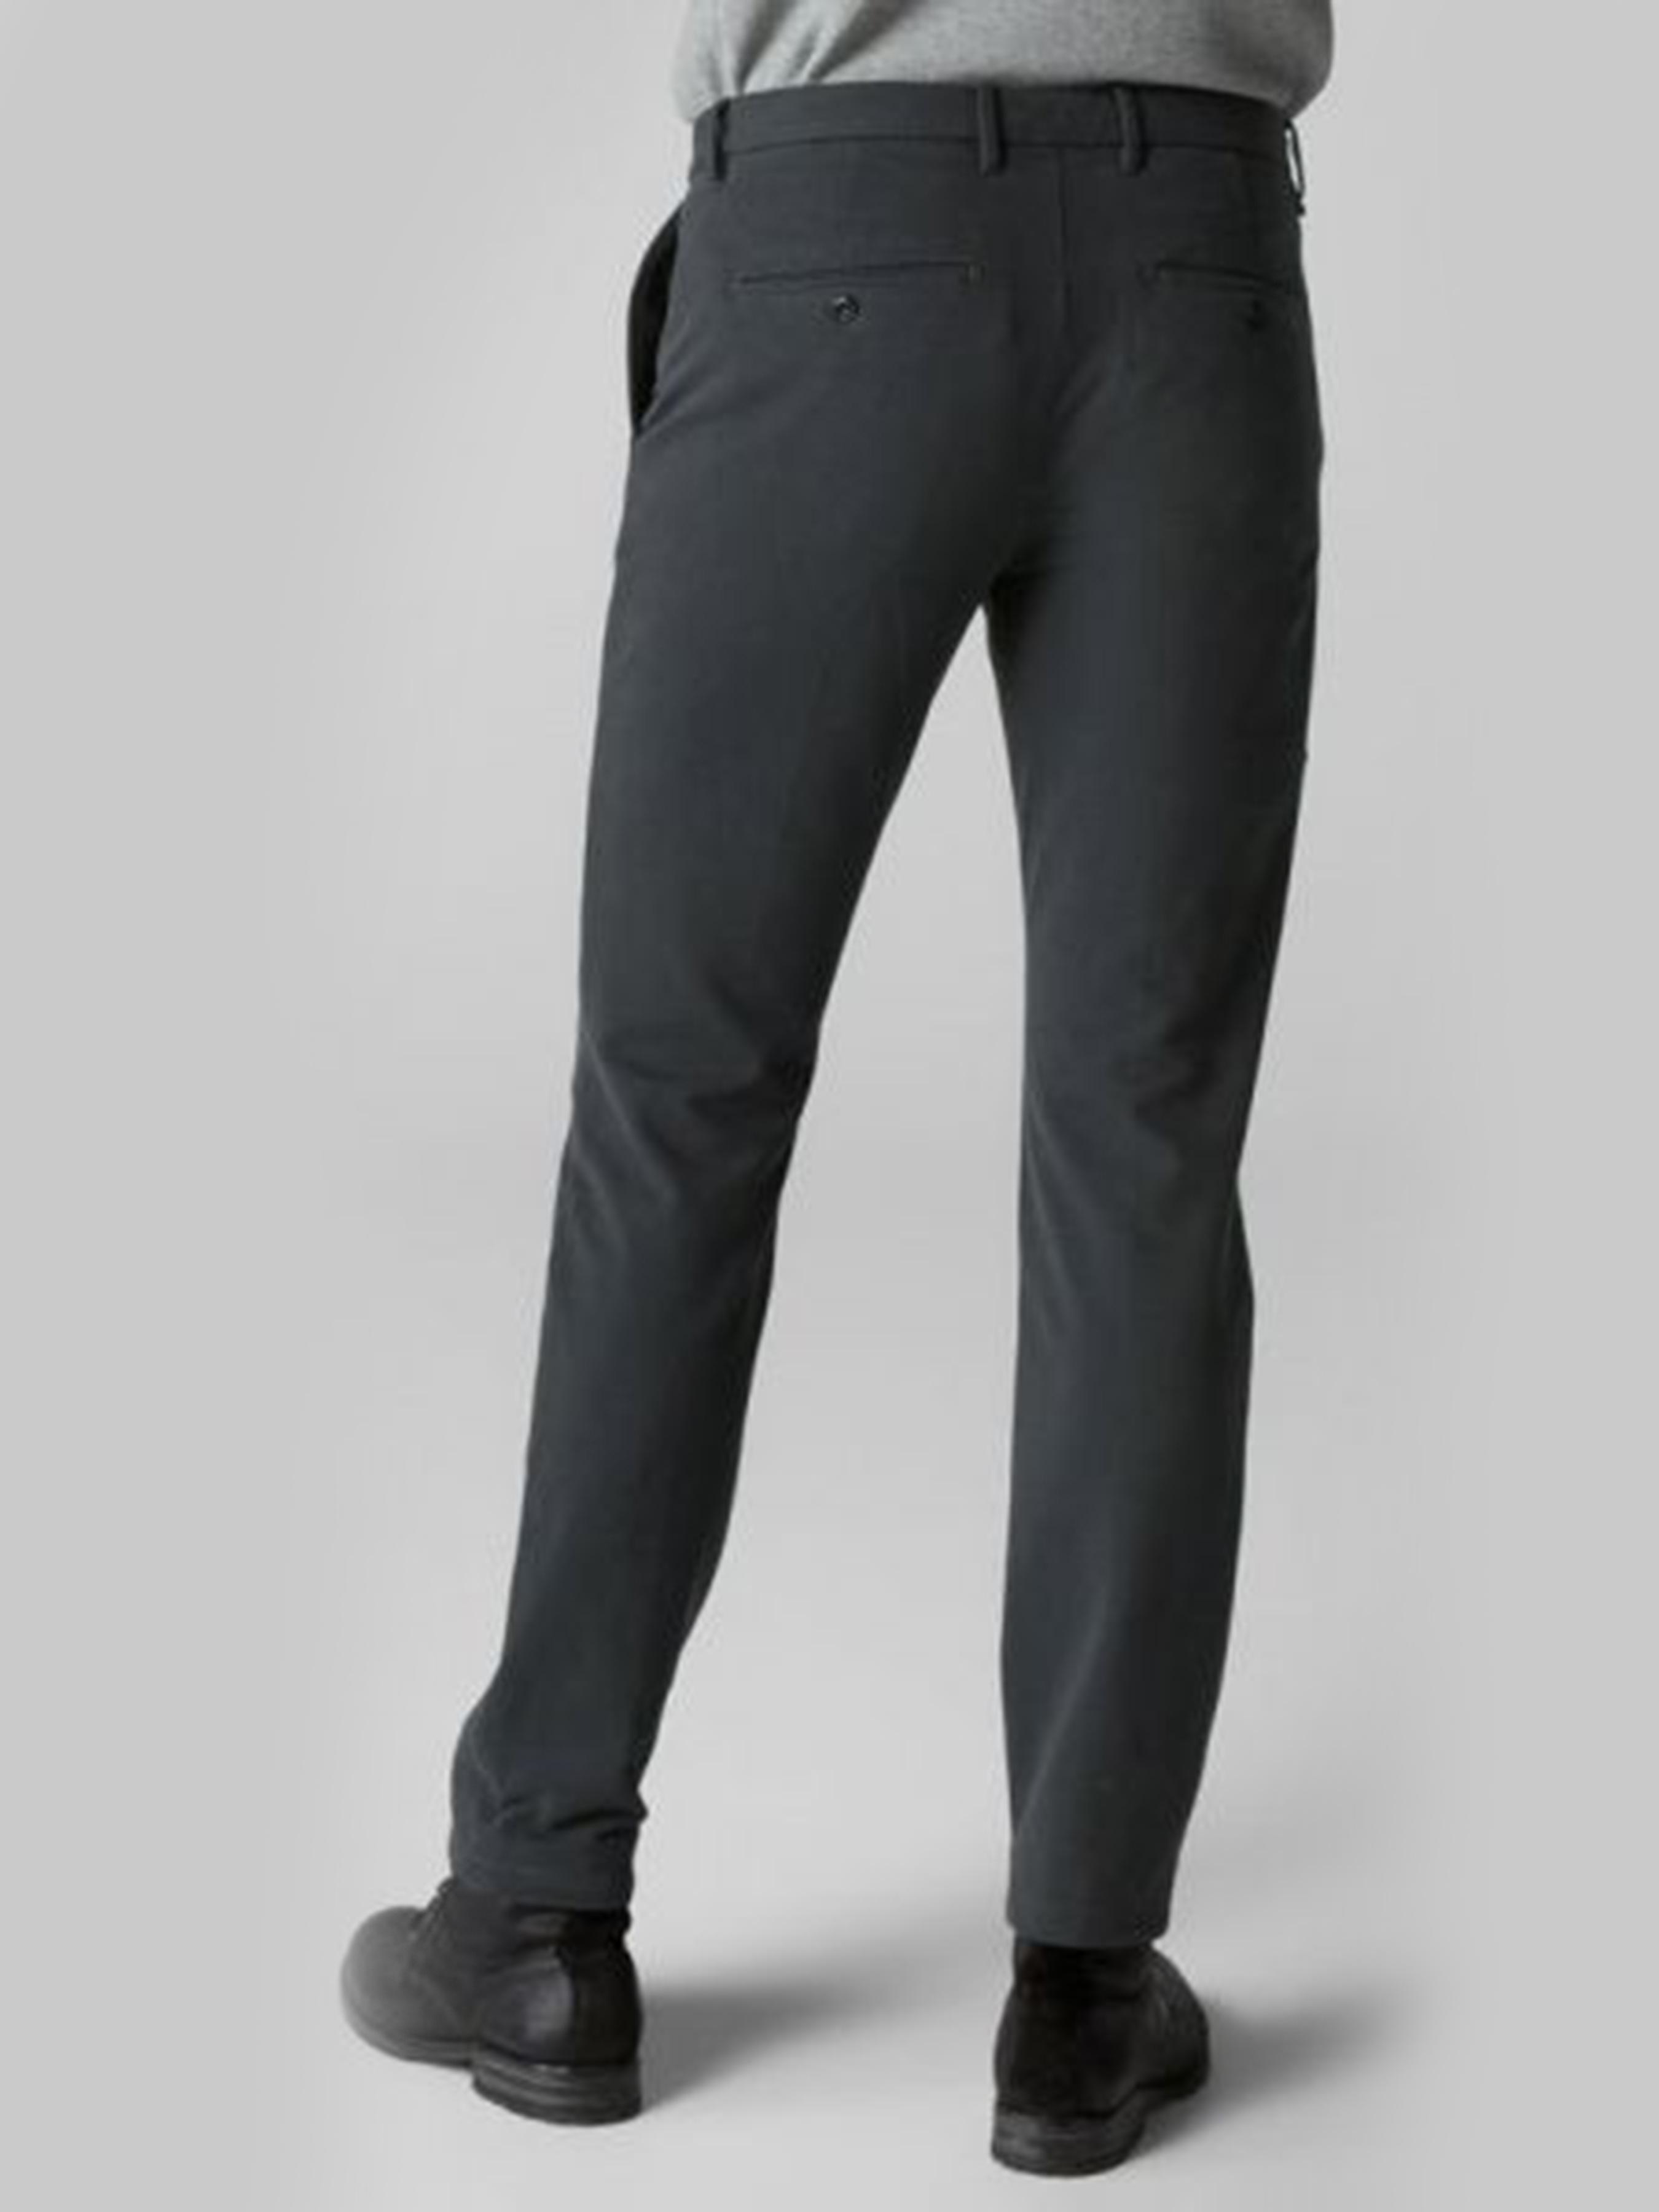 MARC O'POLO Брюки мужские модель PJ873 качество, 2017